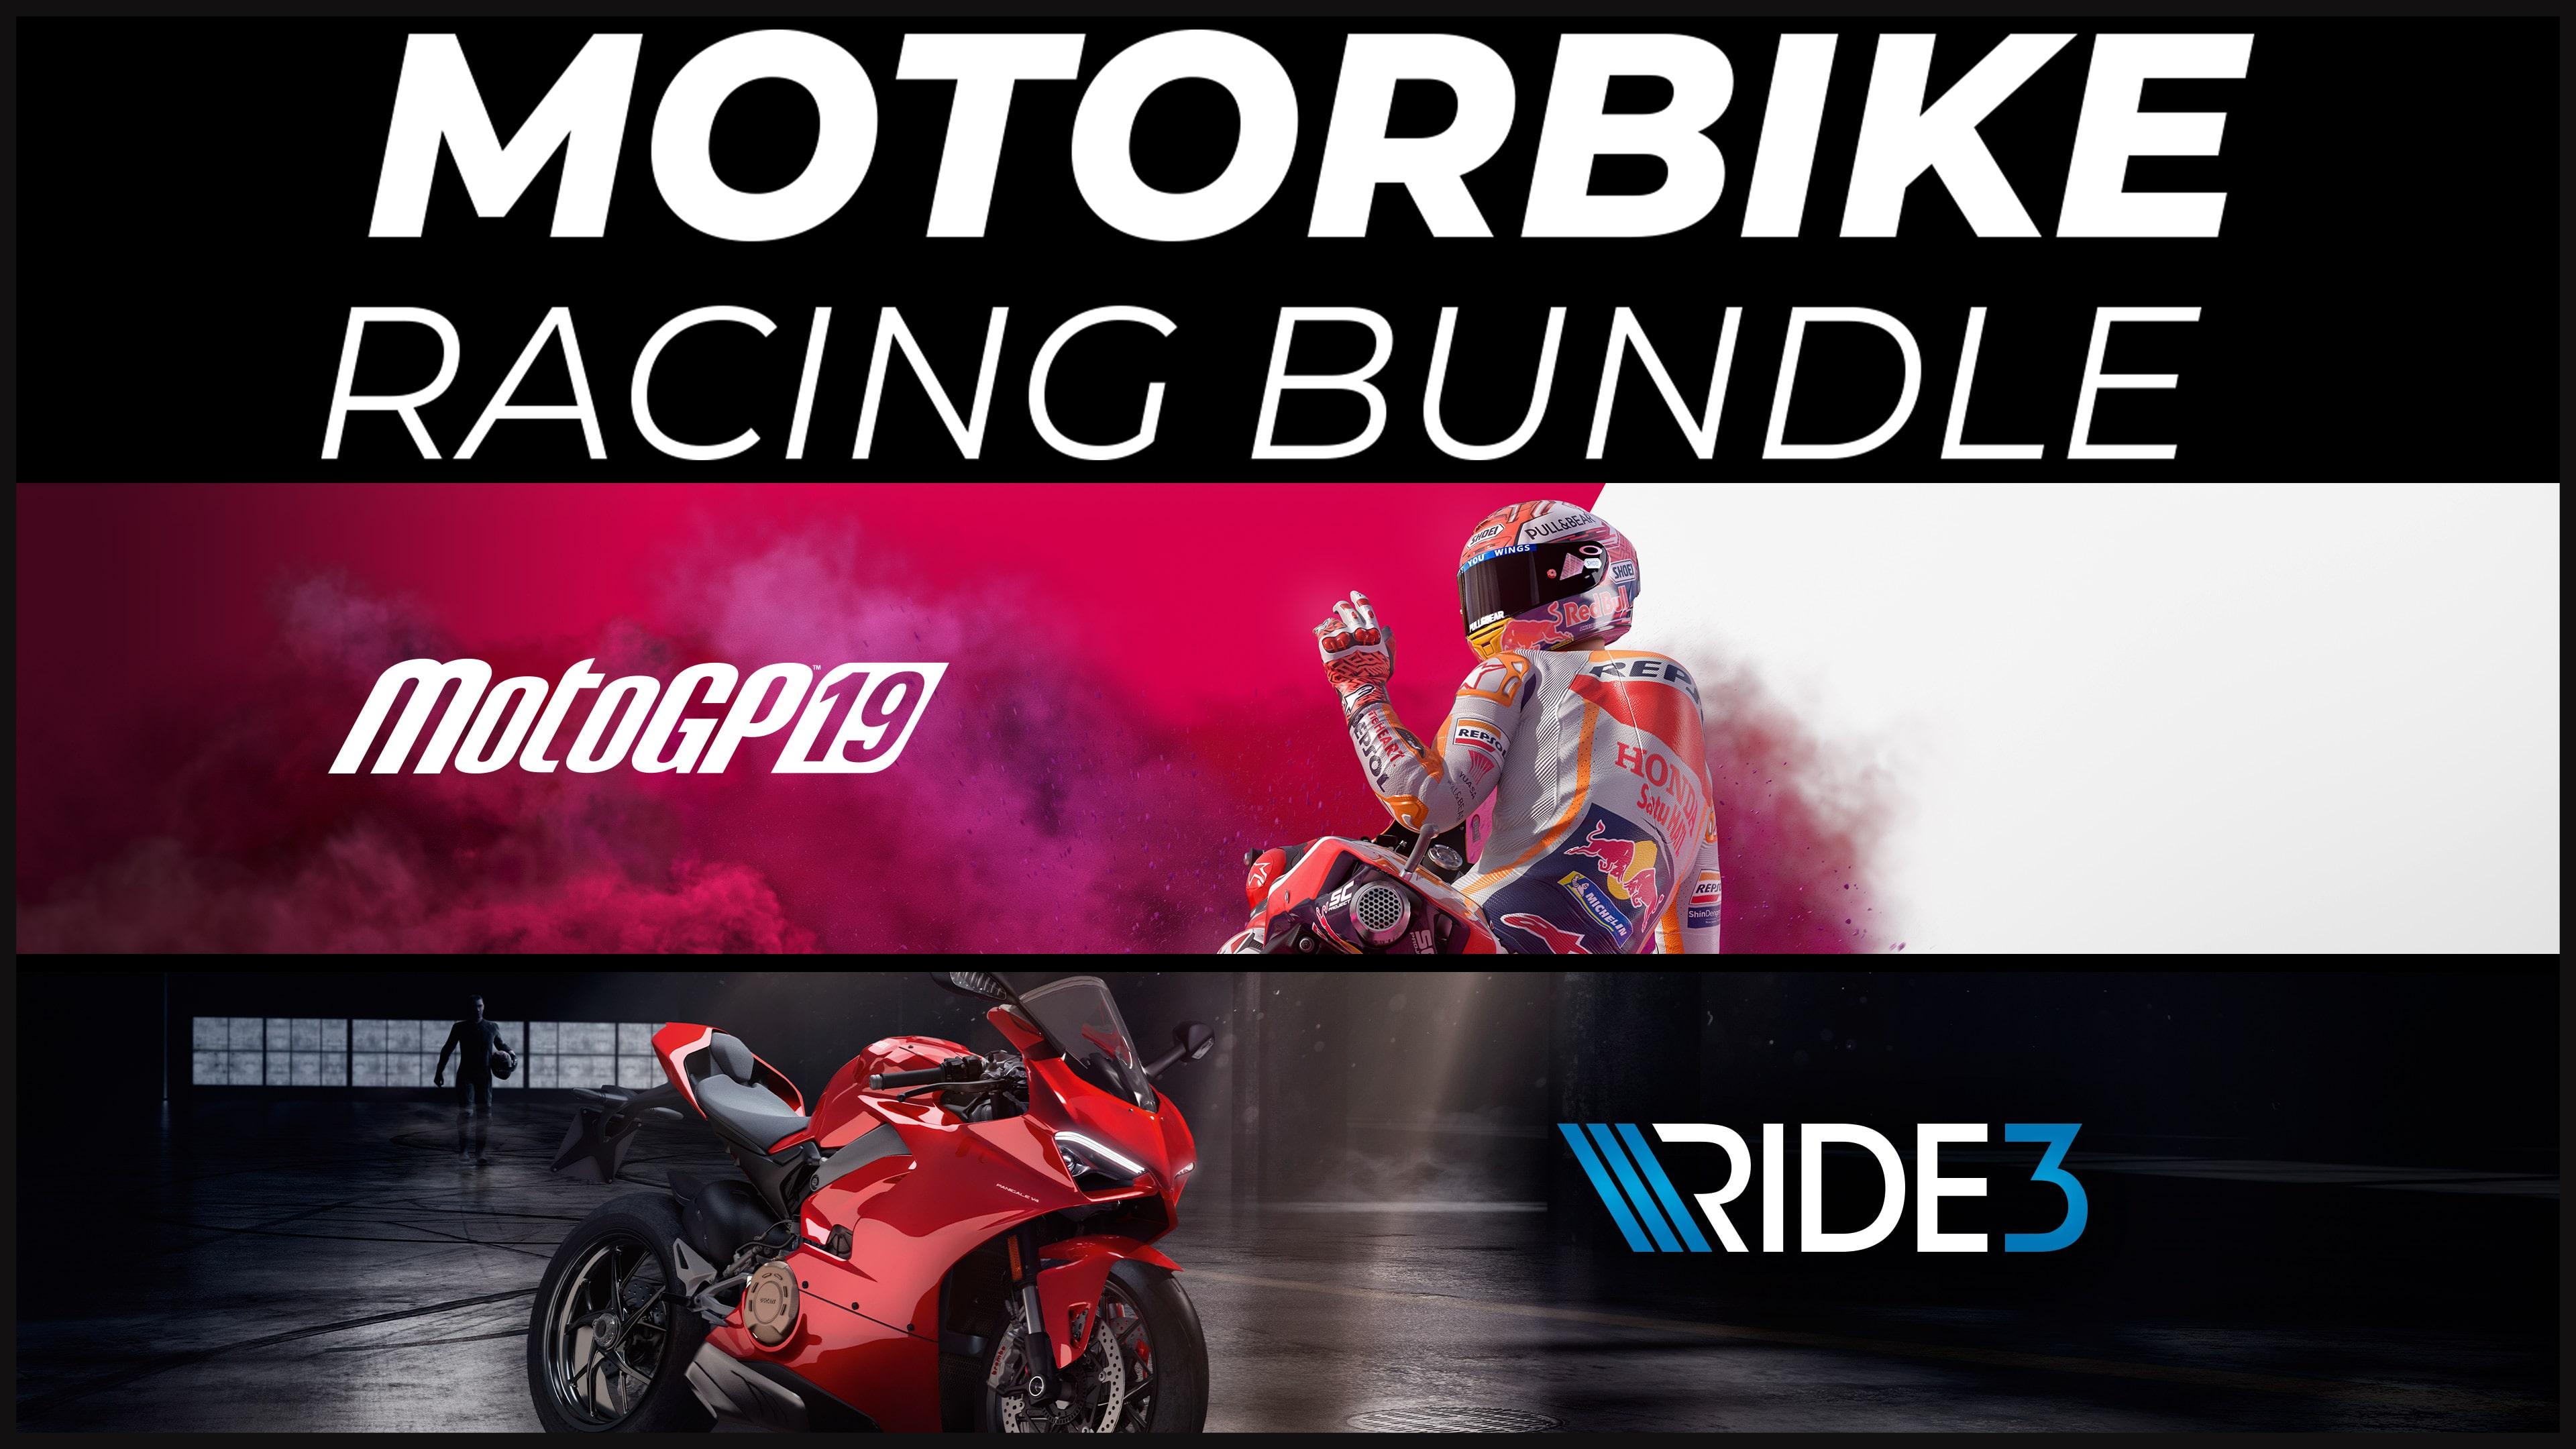 Motorbike Racing Bundle (English)